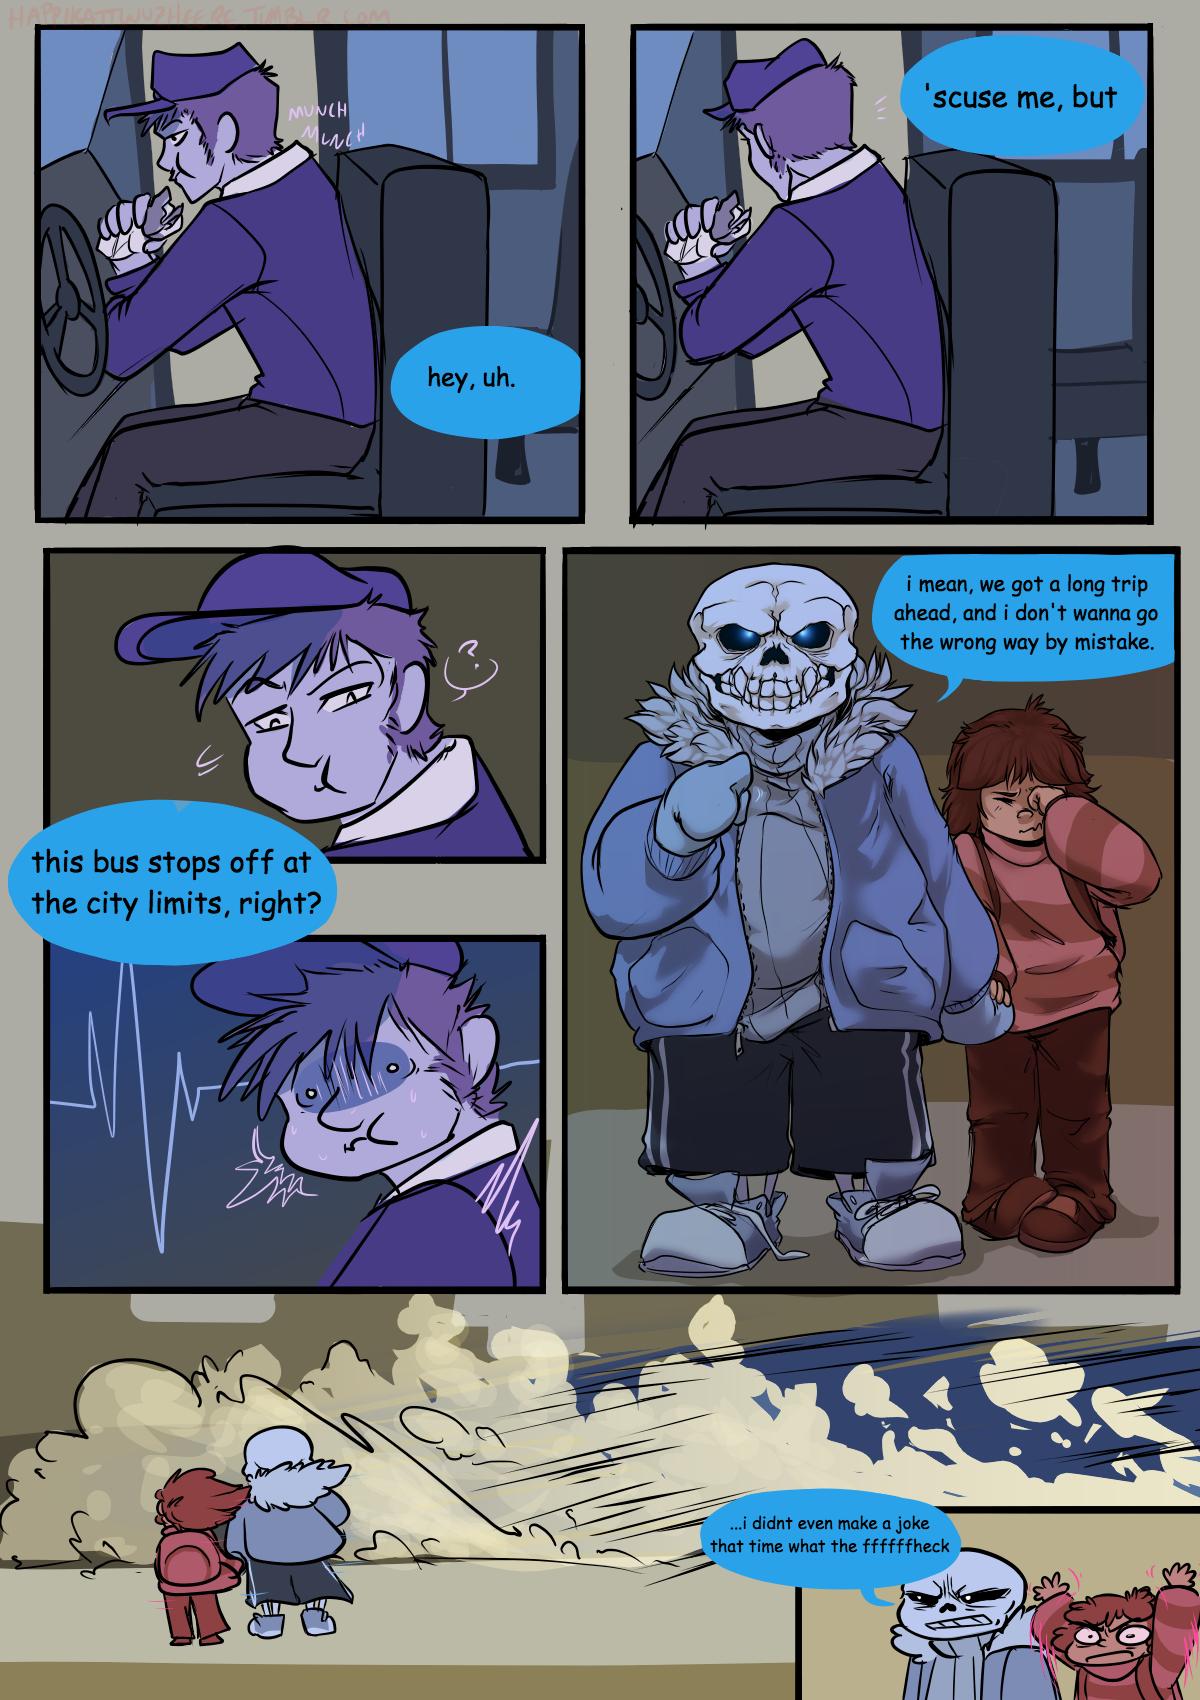 spooky scary sans